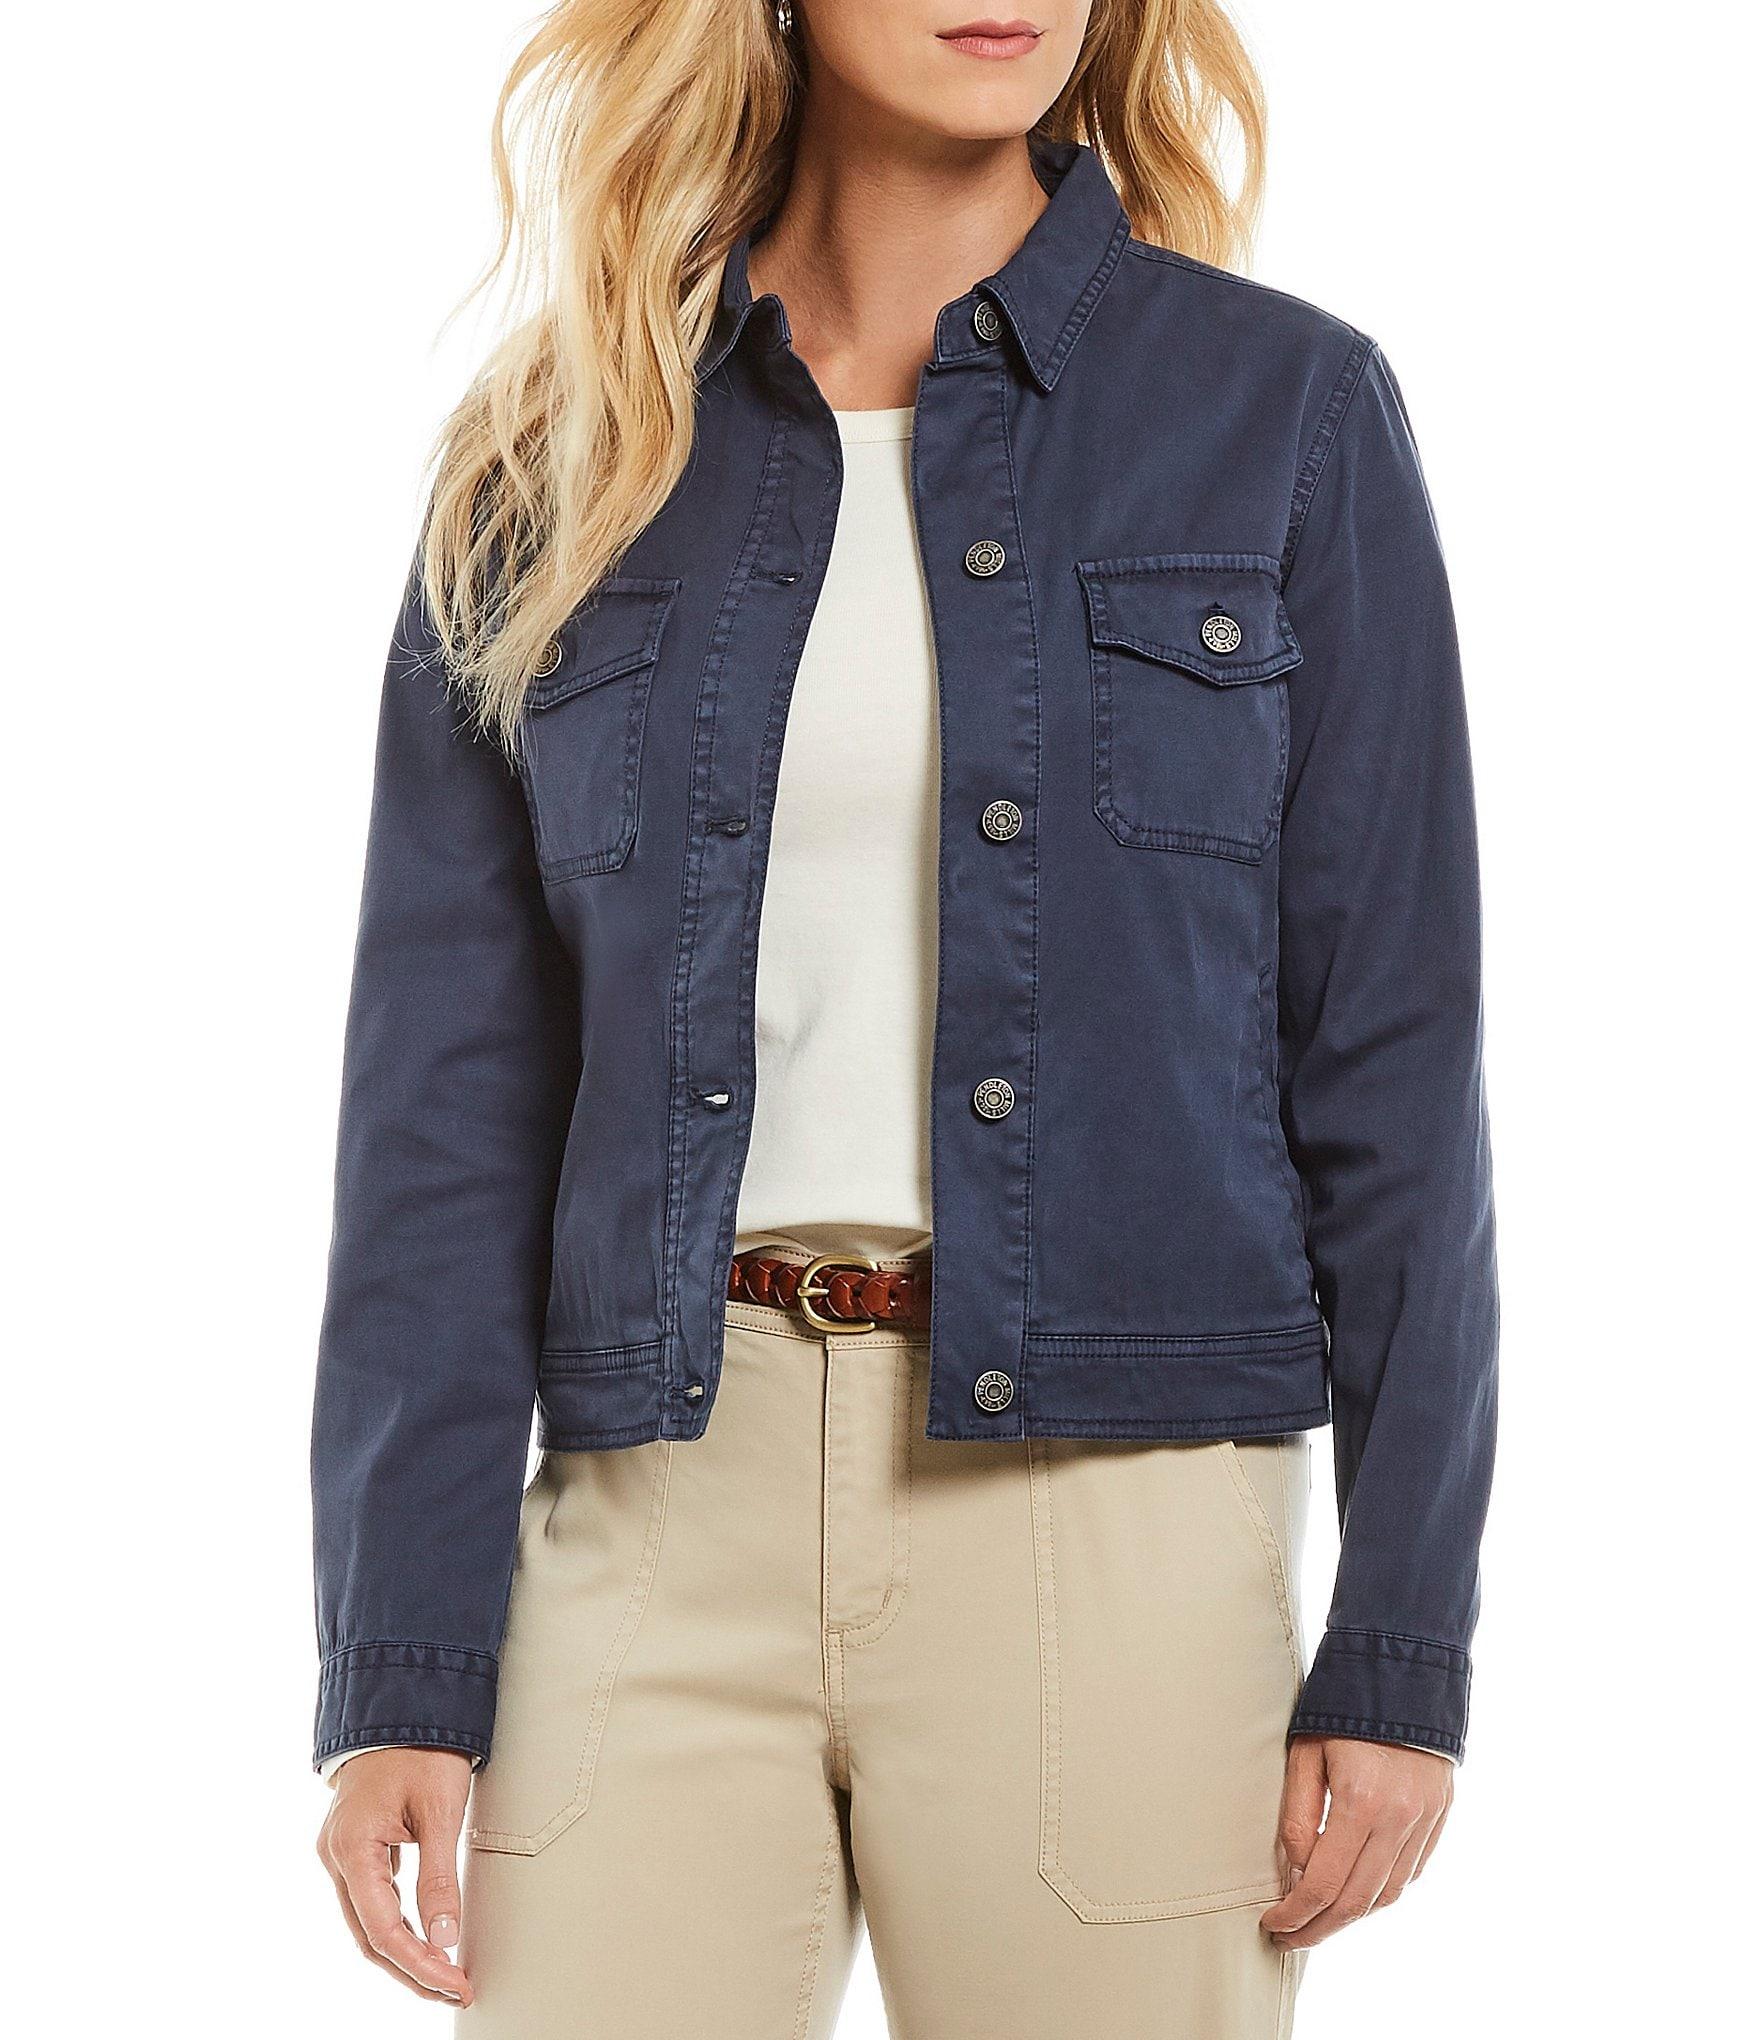 Chino Womens Jackets Vests Dillards Dillards